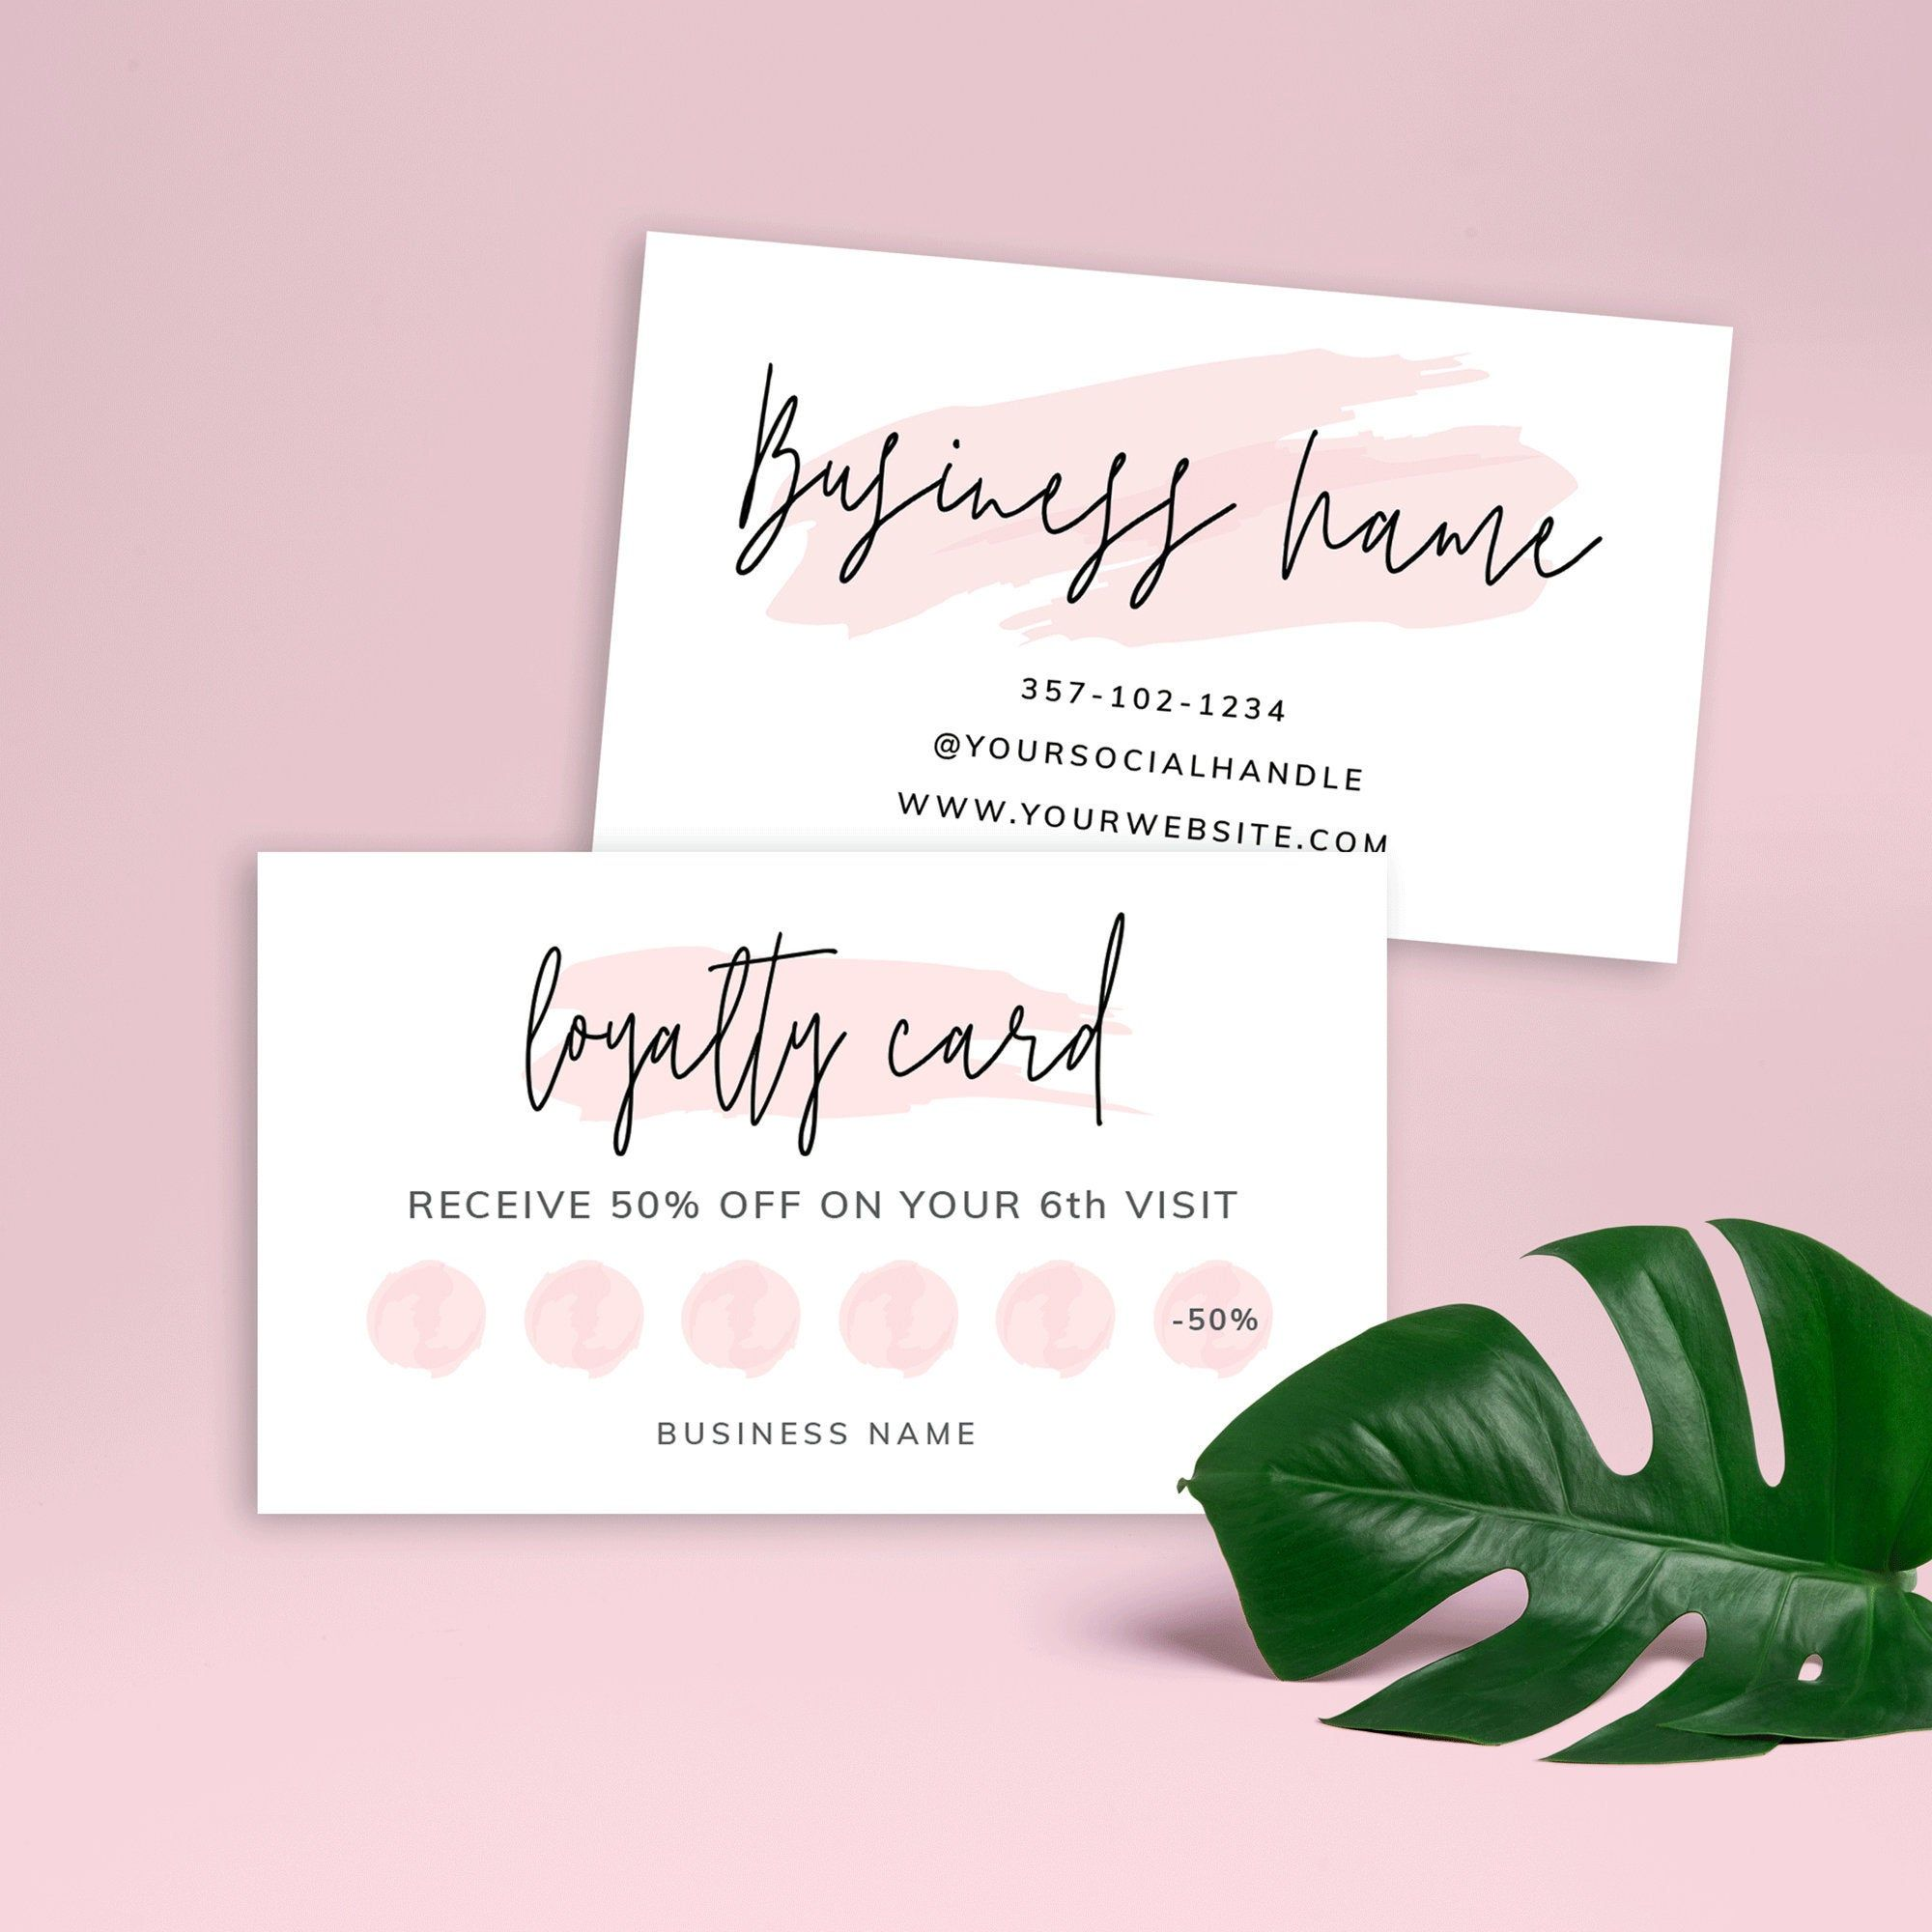 Printable Loyalty Card Beauty Loyalty Card Template Editable Etsy Loyalty Card Template Customer Loyalty Cards Loyalty Card Design